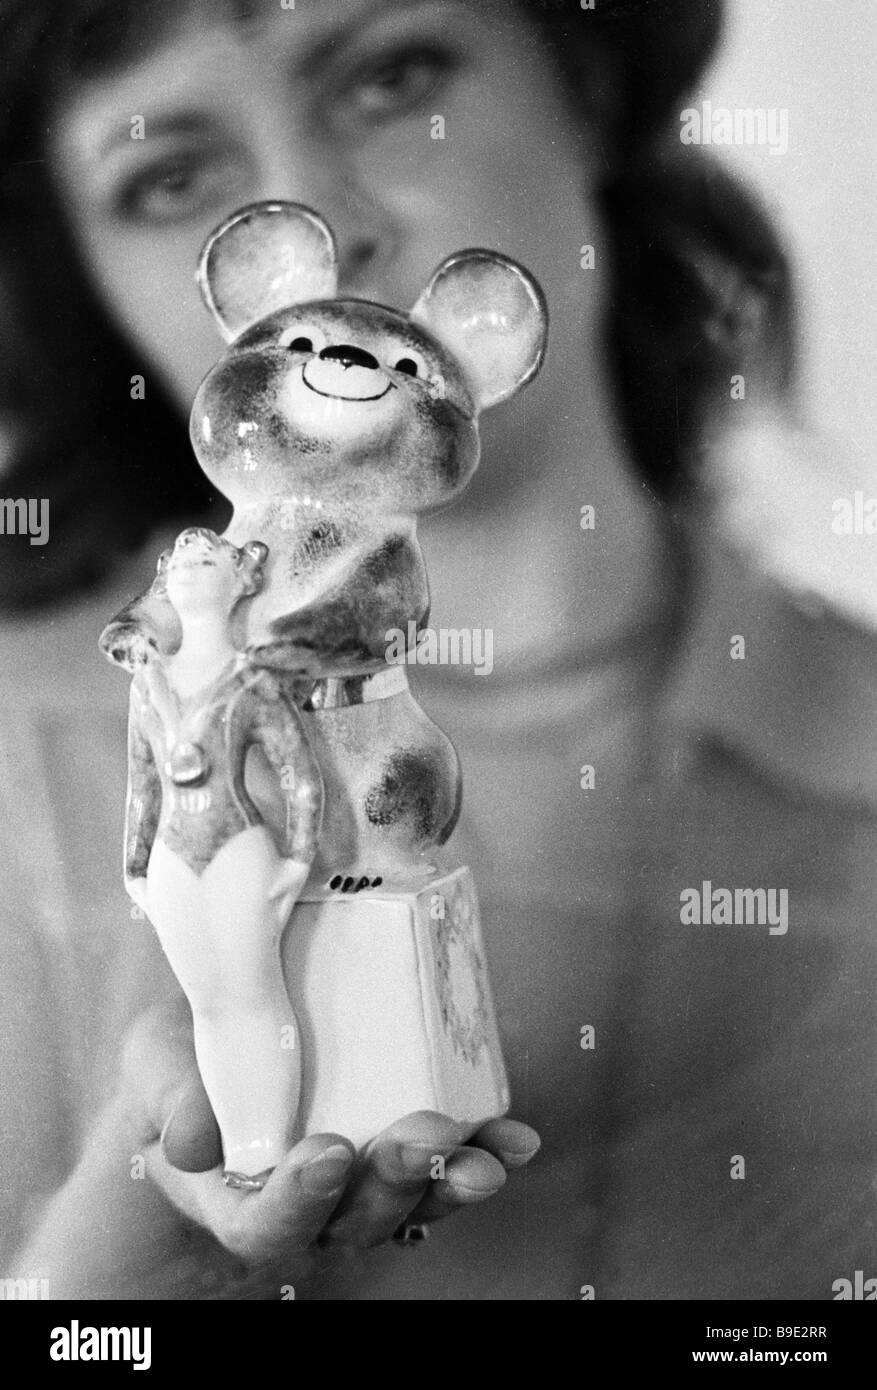 Olympic mascot Mishka a memento produced by Dulevo Pravda Newspaper Porcelain Factory - Stock Image